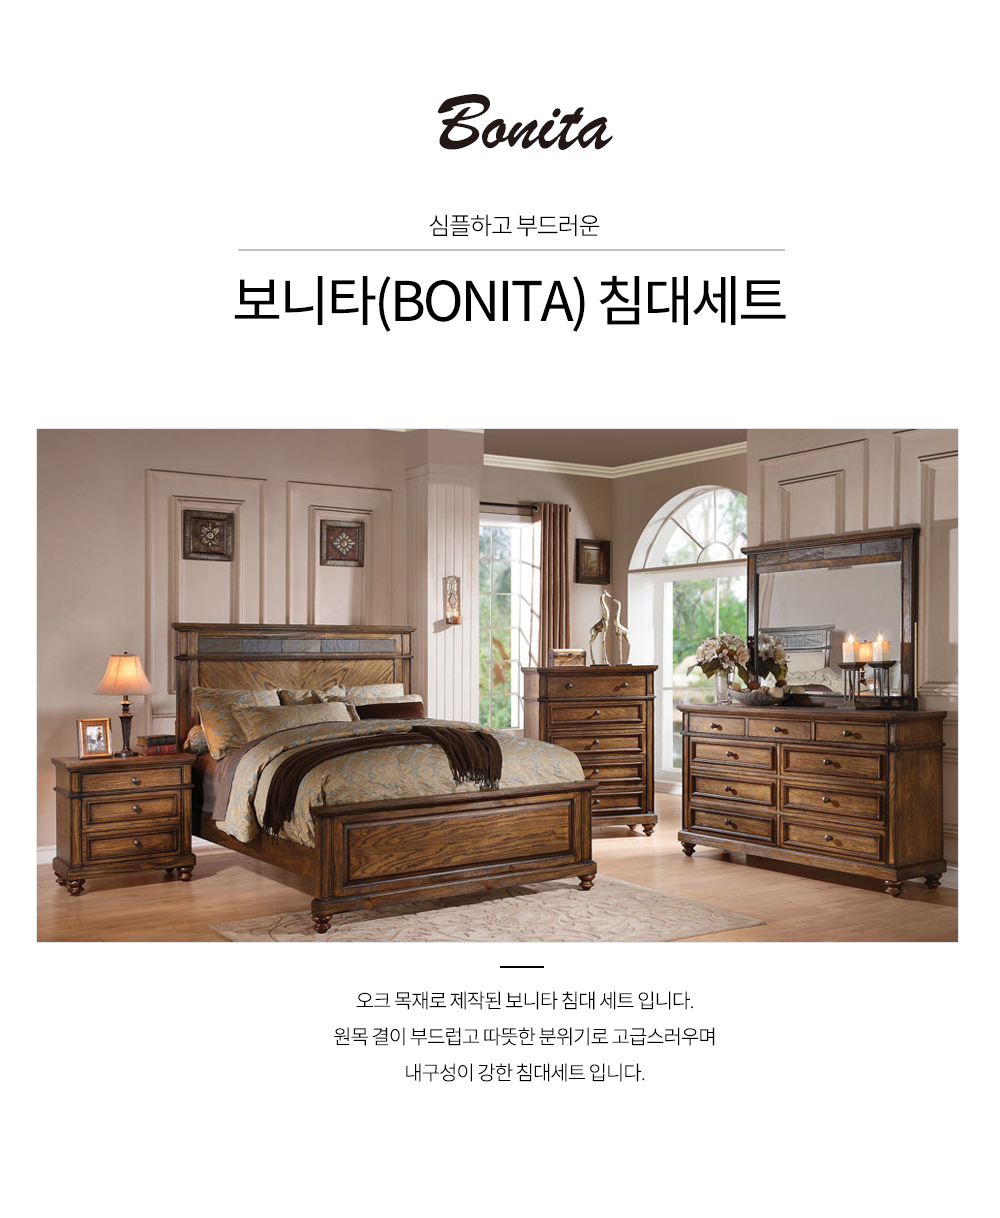 bonita01.jpg